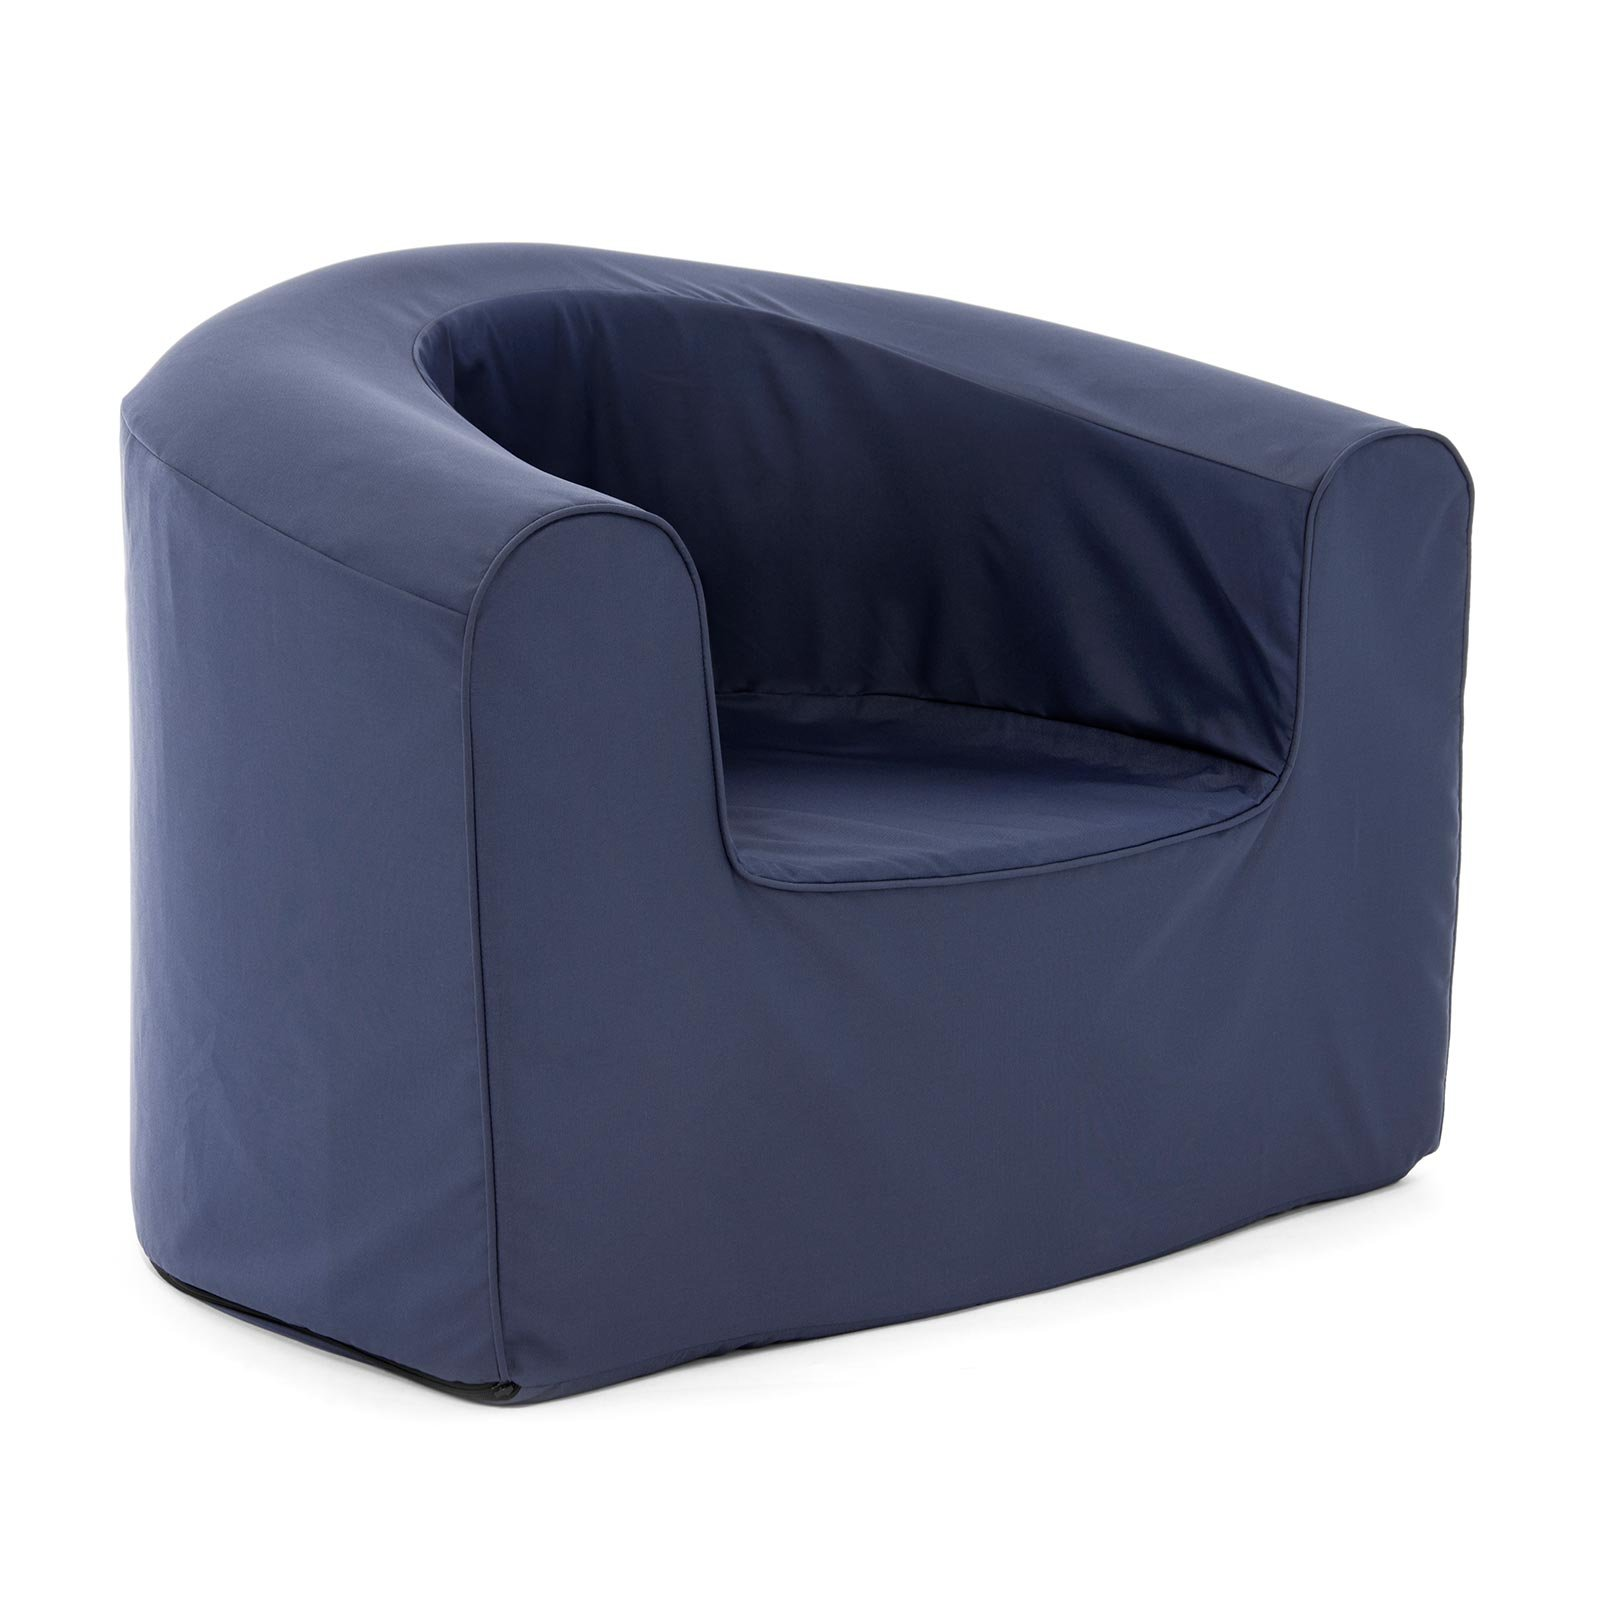 PopLounge Expandable Foam Furniture Armchair, Crown Blue Navy, 35'' x 28'' x 26''